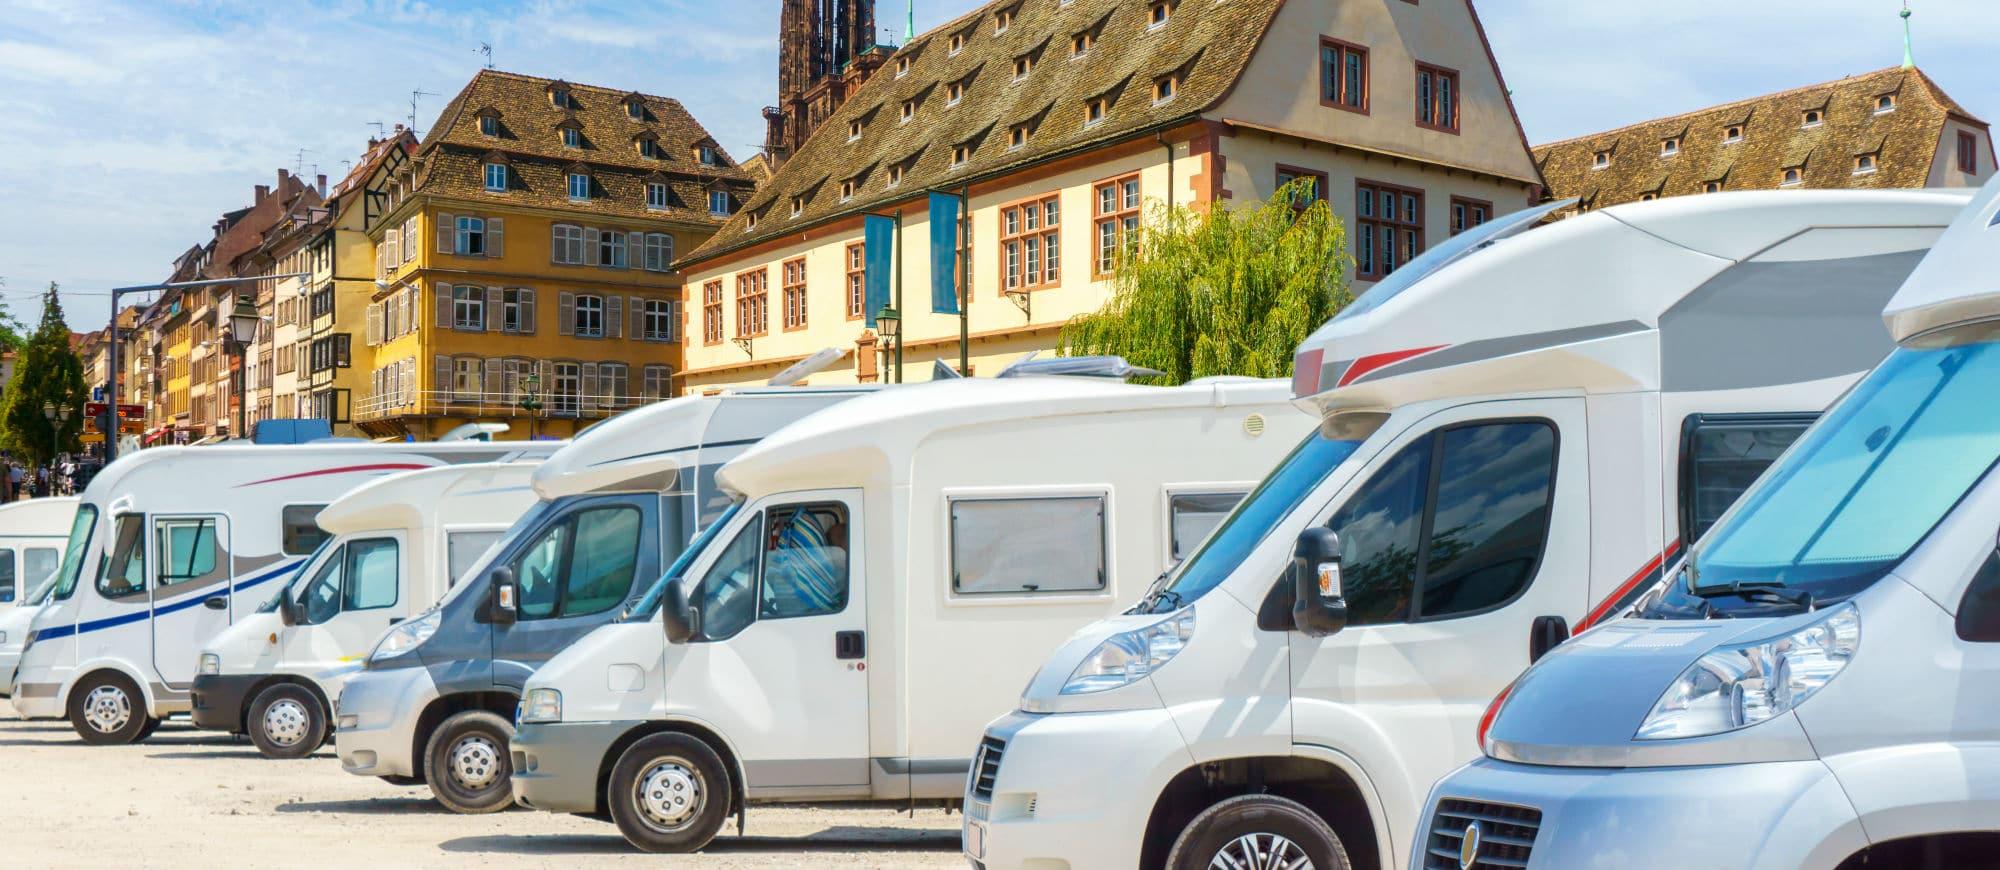 Place de stationnement camping car Strasbourg